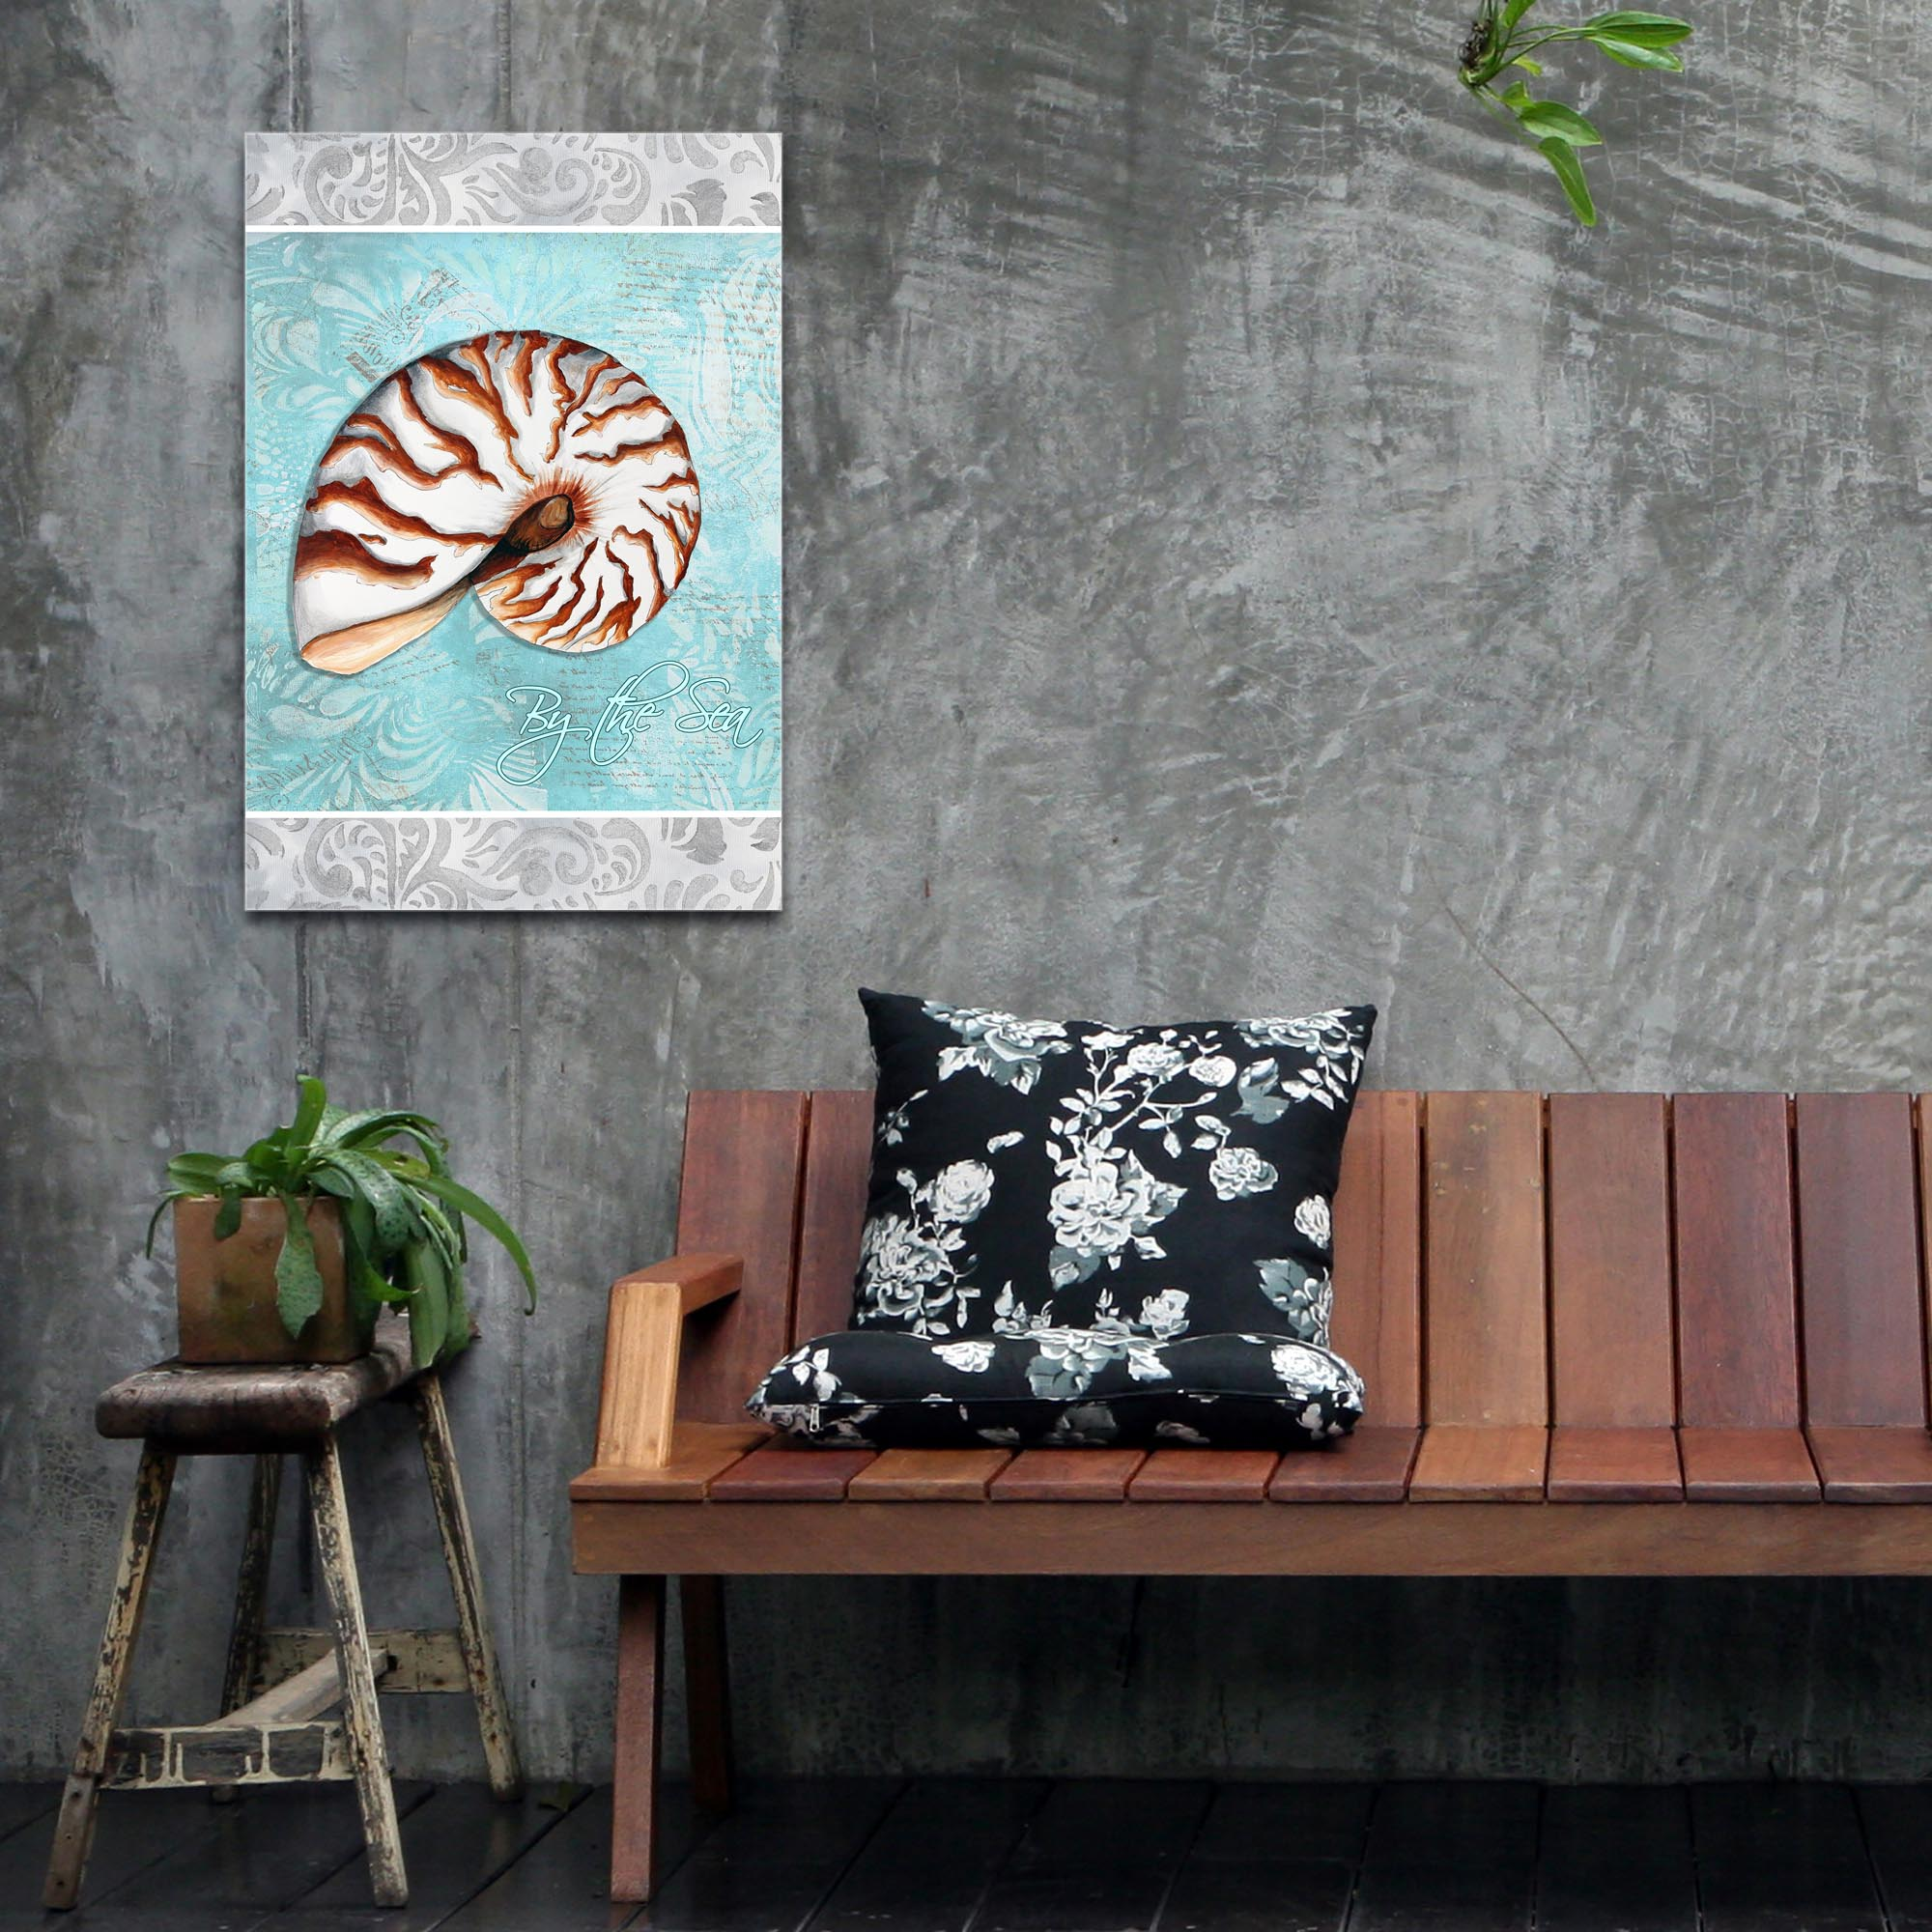 Beach Decor 'By the Sea v1' - Coastal Bathroom Art on Metal or Acrylic - Lifestyle View 2